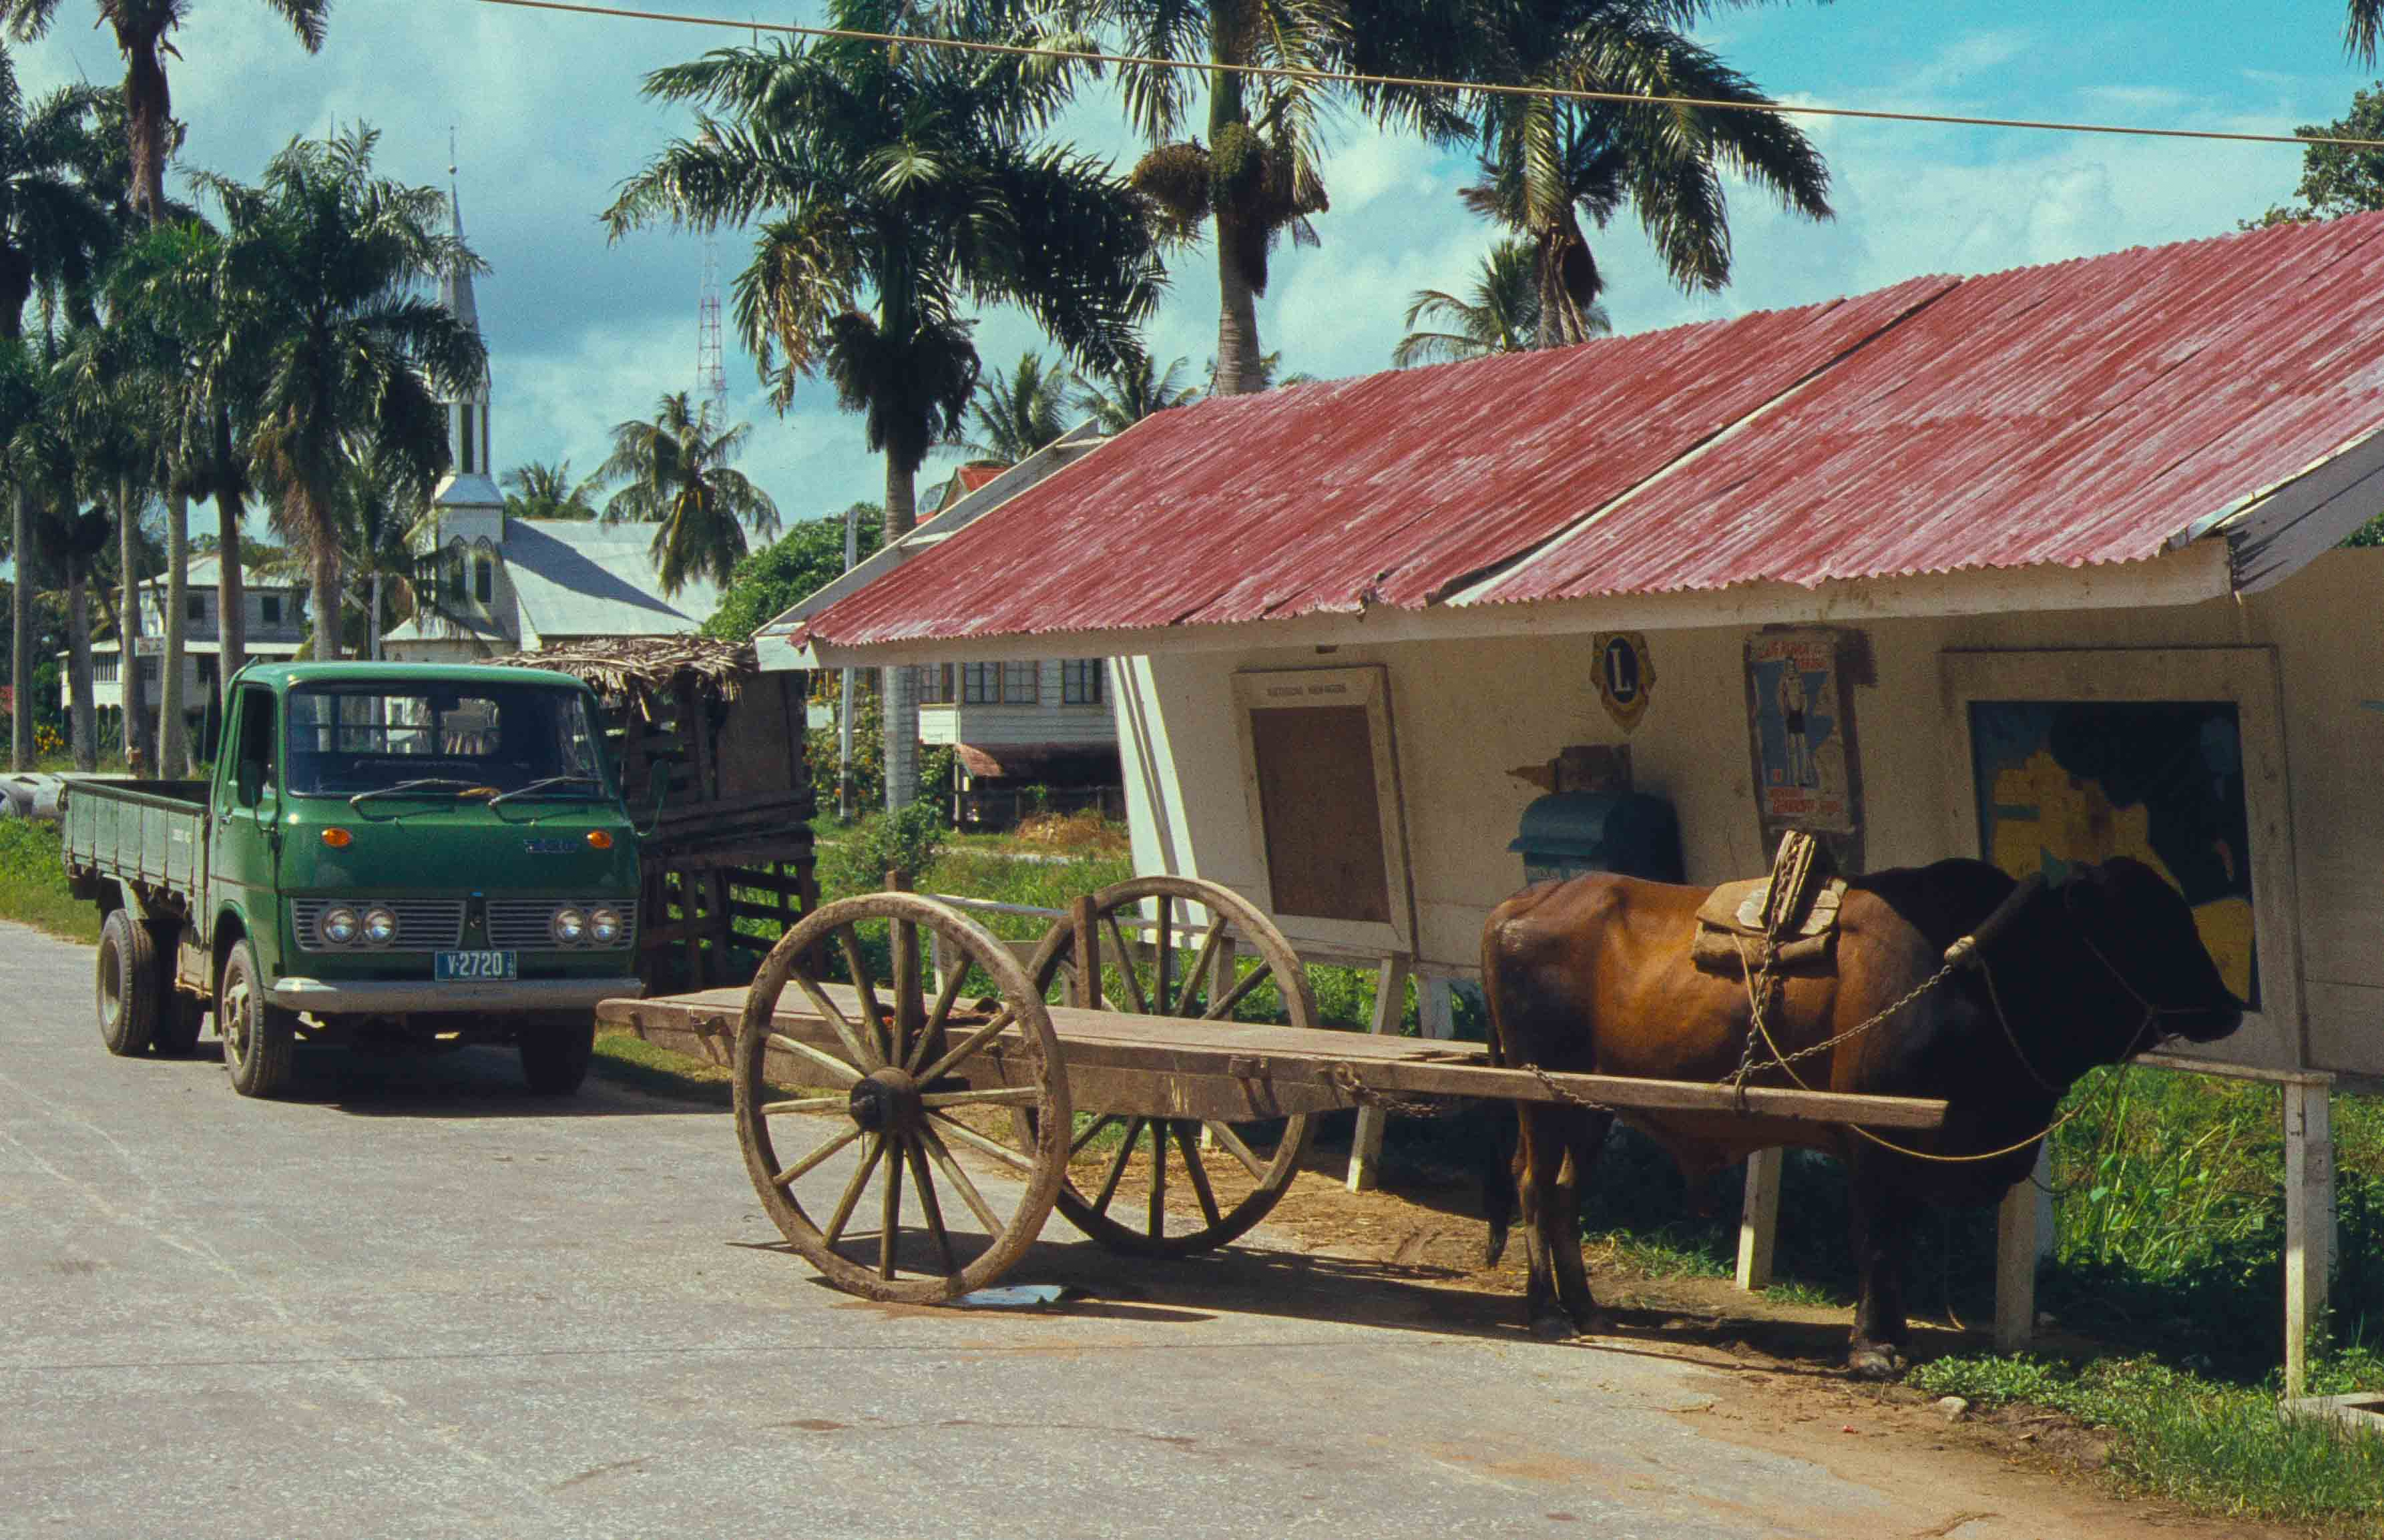 345. Suriname